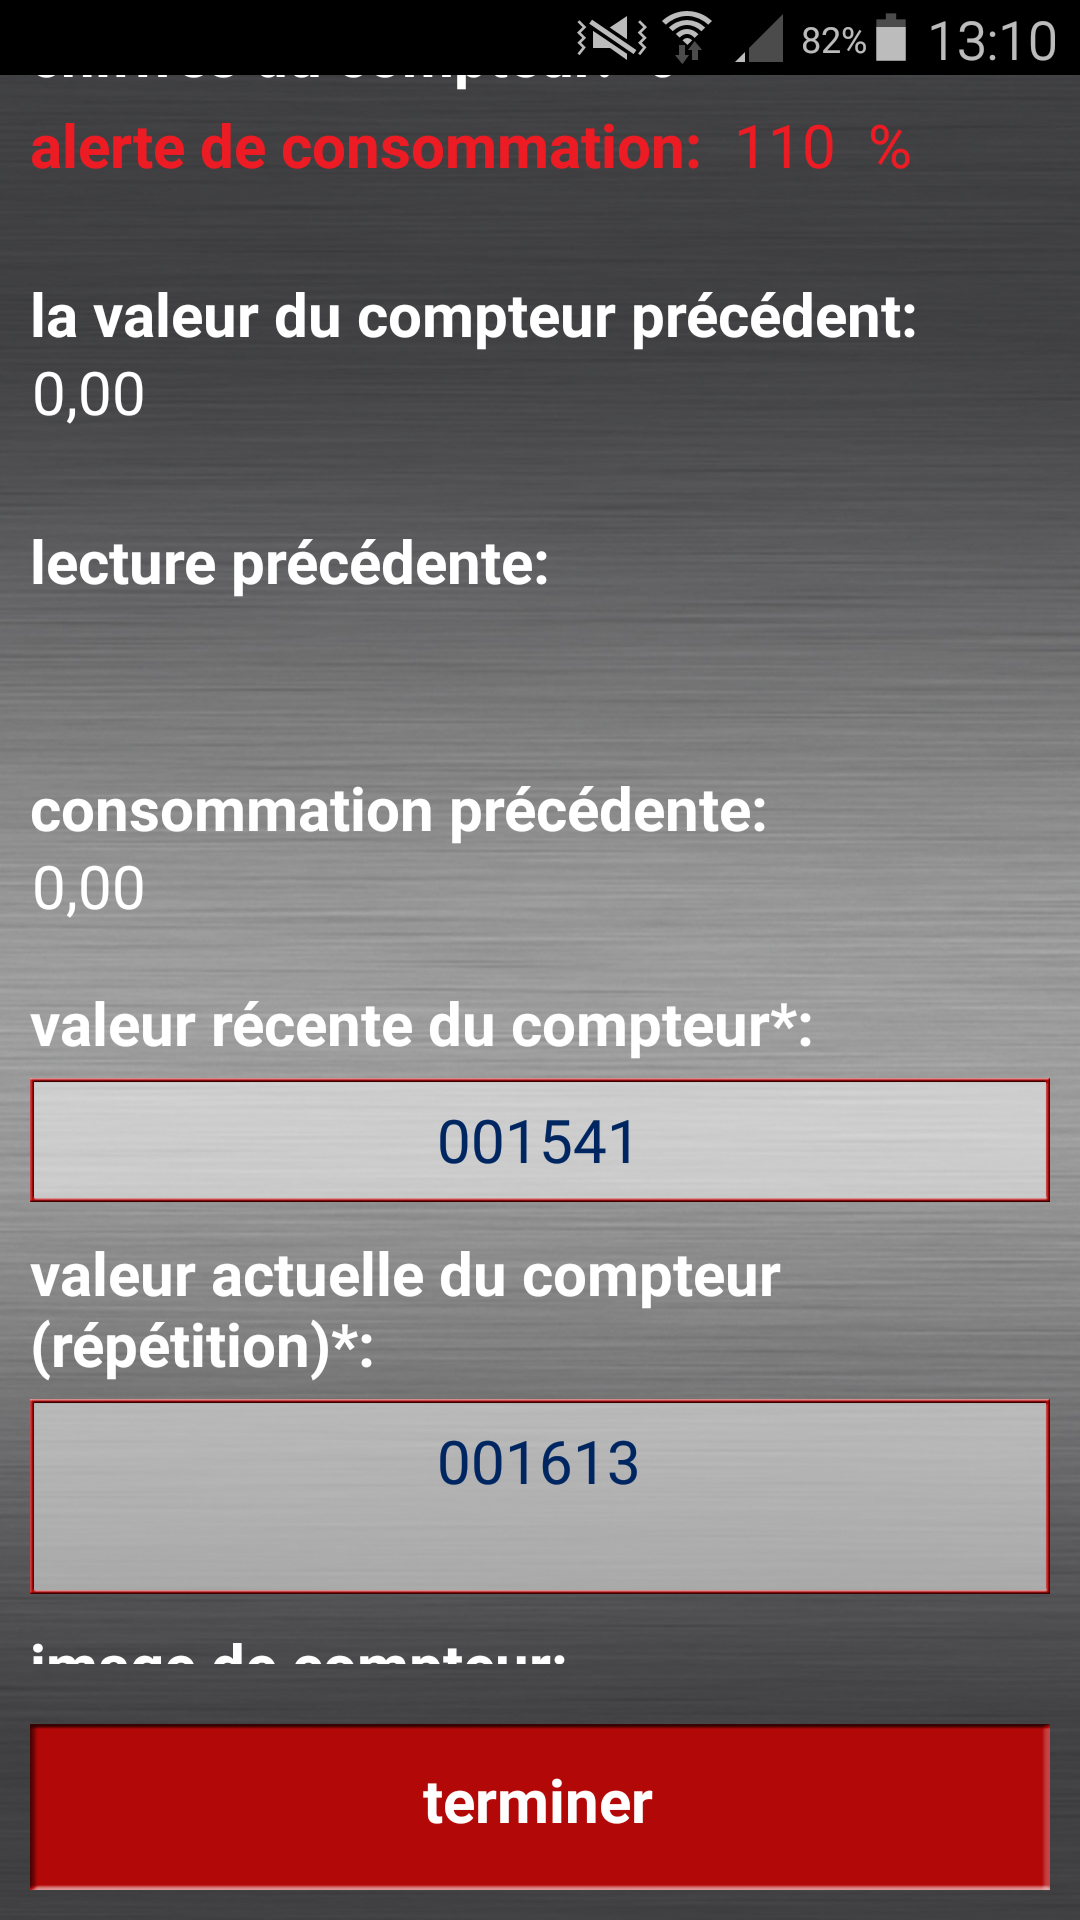 ginstr_app_electricMeterCabinetReading_FR_9